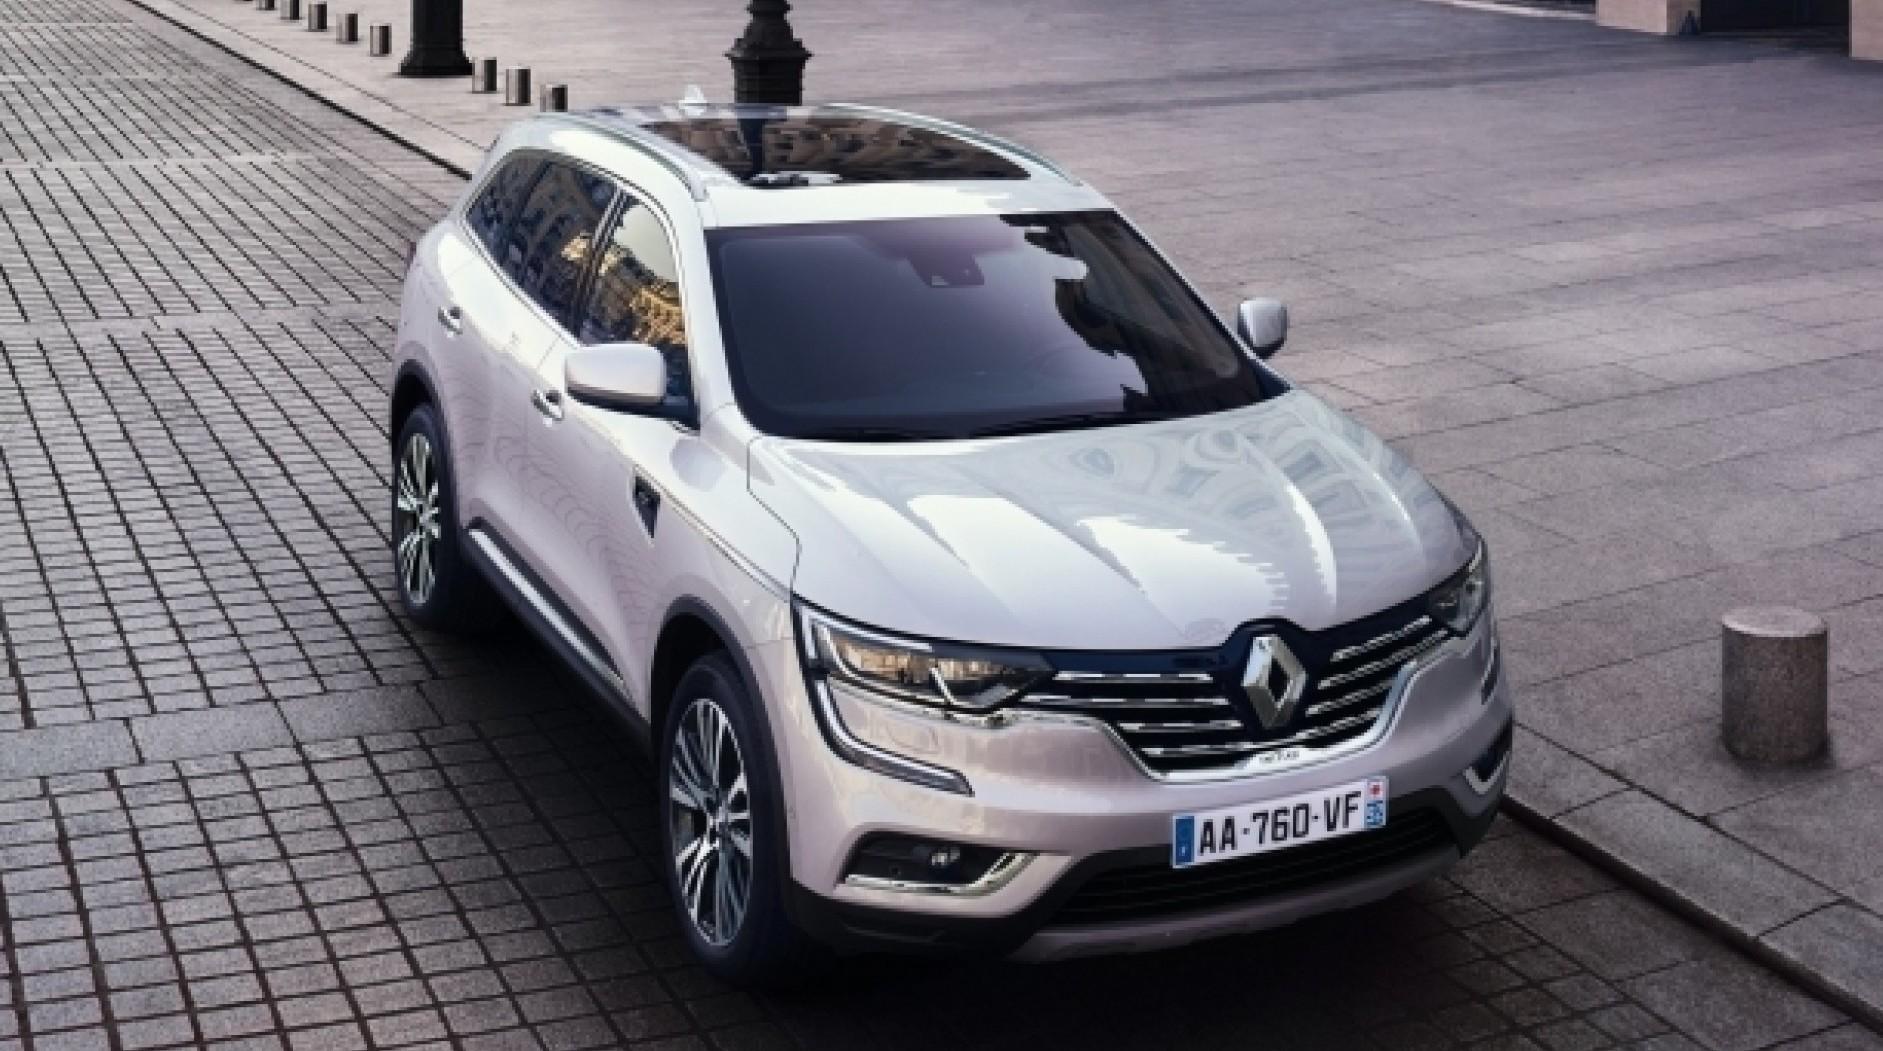 Renault Koleos 2019 prezzi listino, mode